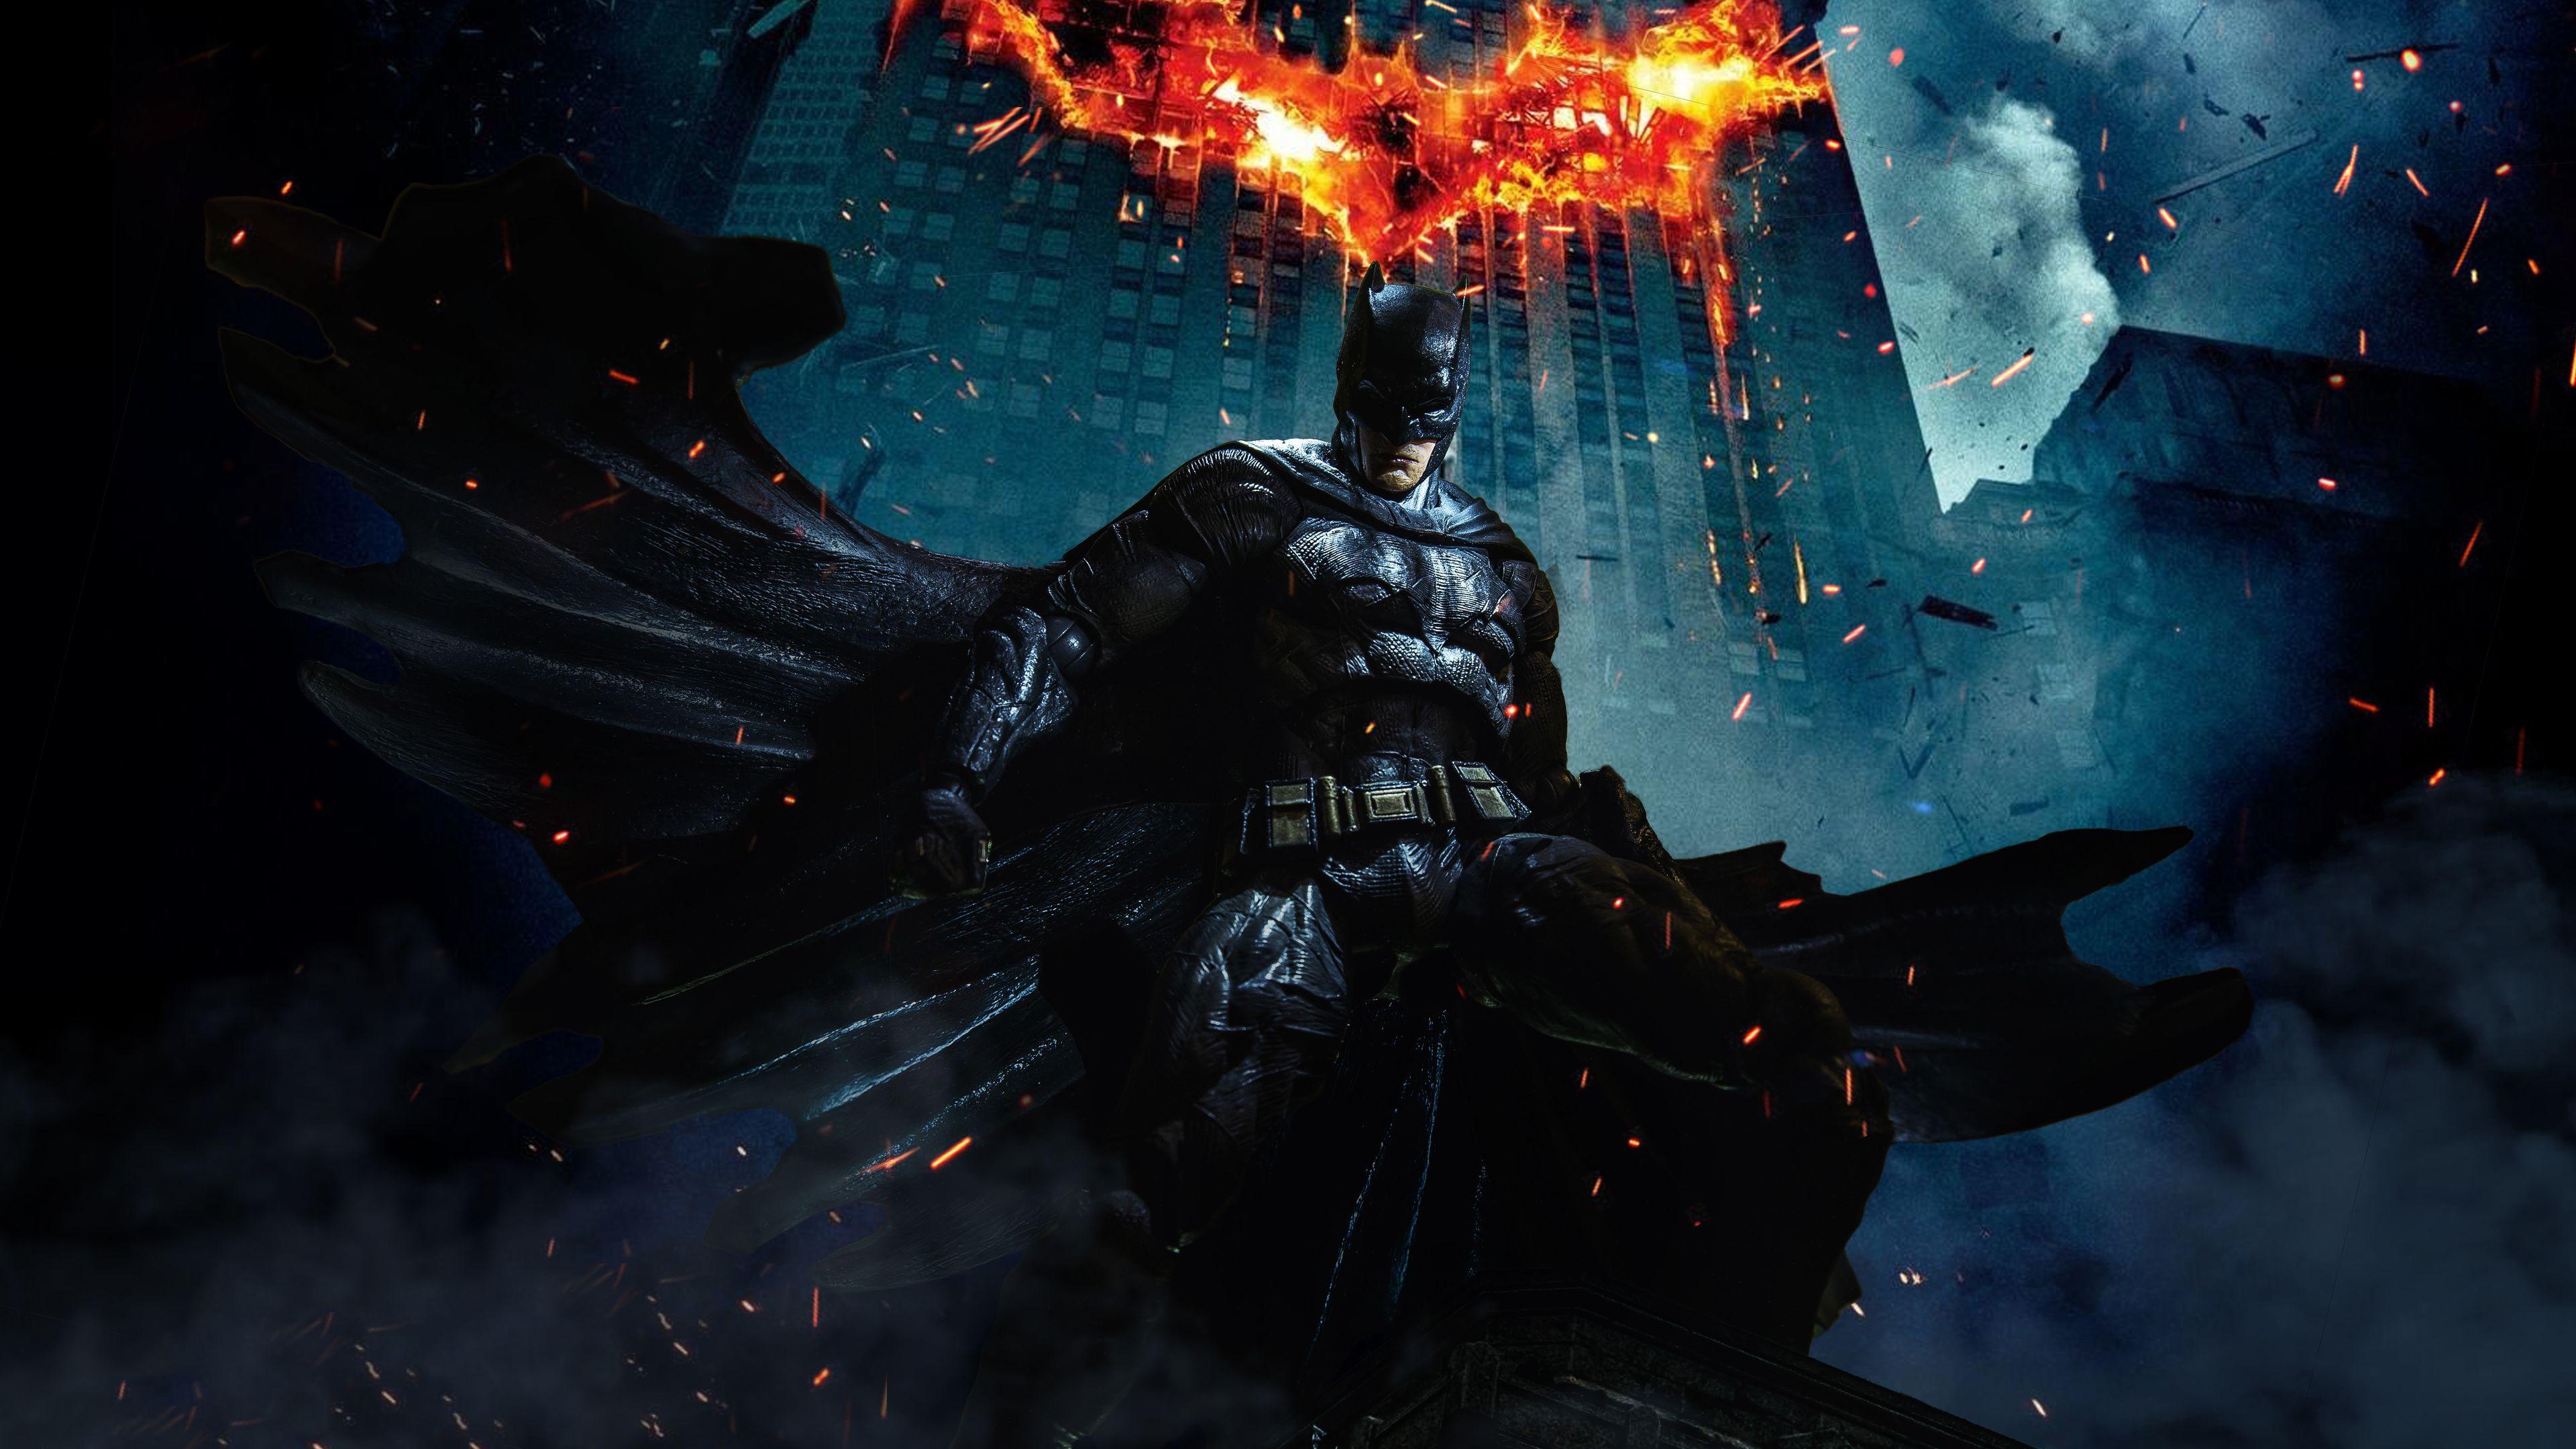 Batman Dark Knight 5k Superheroes Wallpapers Hd Wallpapers Digital Art Wallpapers Batman Wallpapers Artwork Batman The Dark Knight Batman Dark Dark Knight